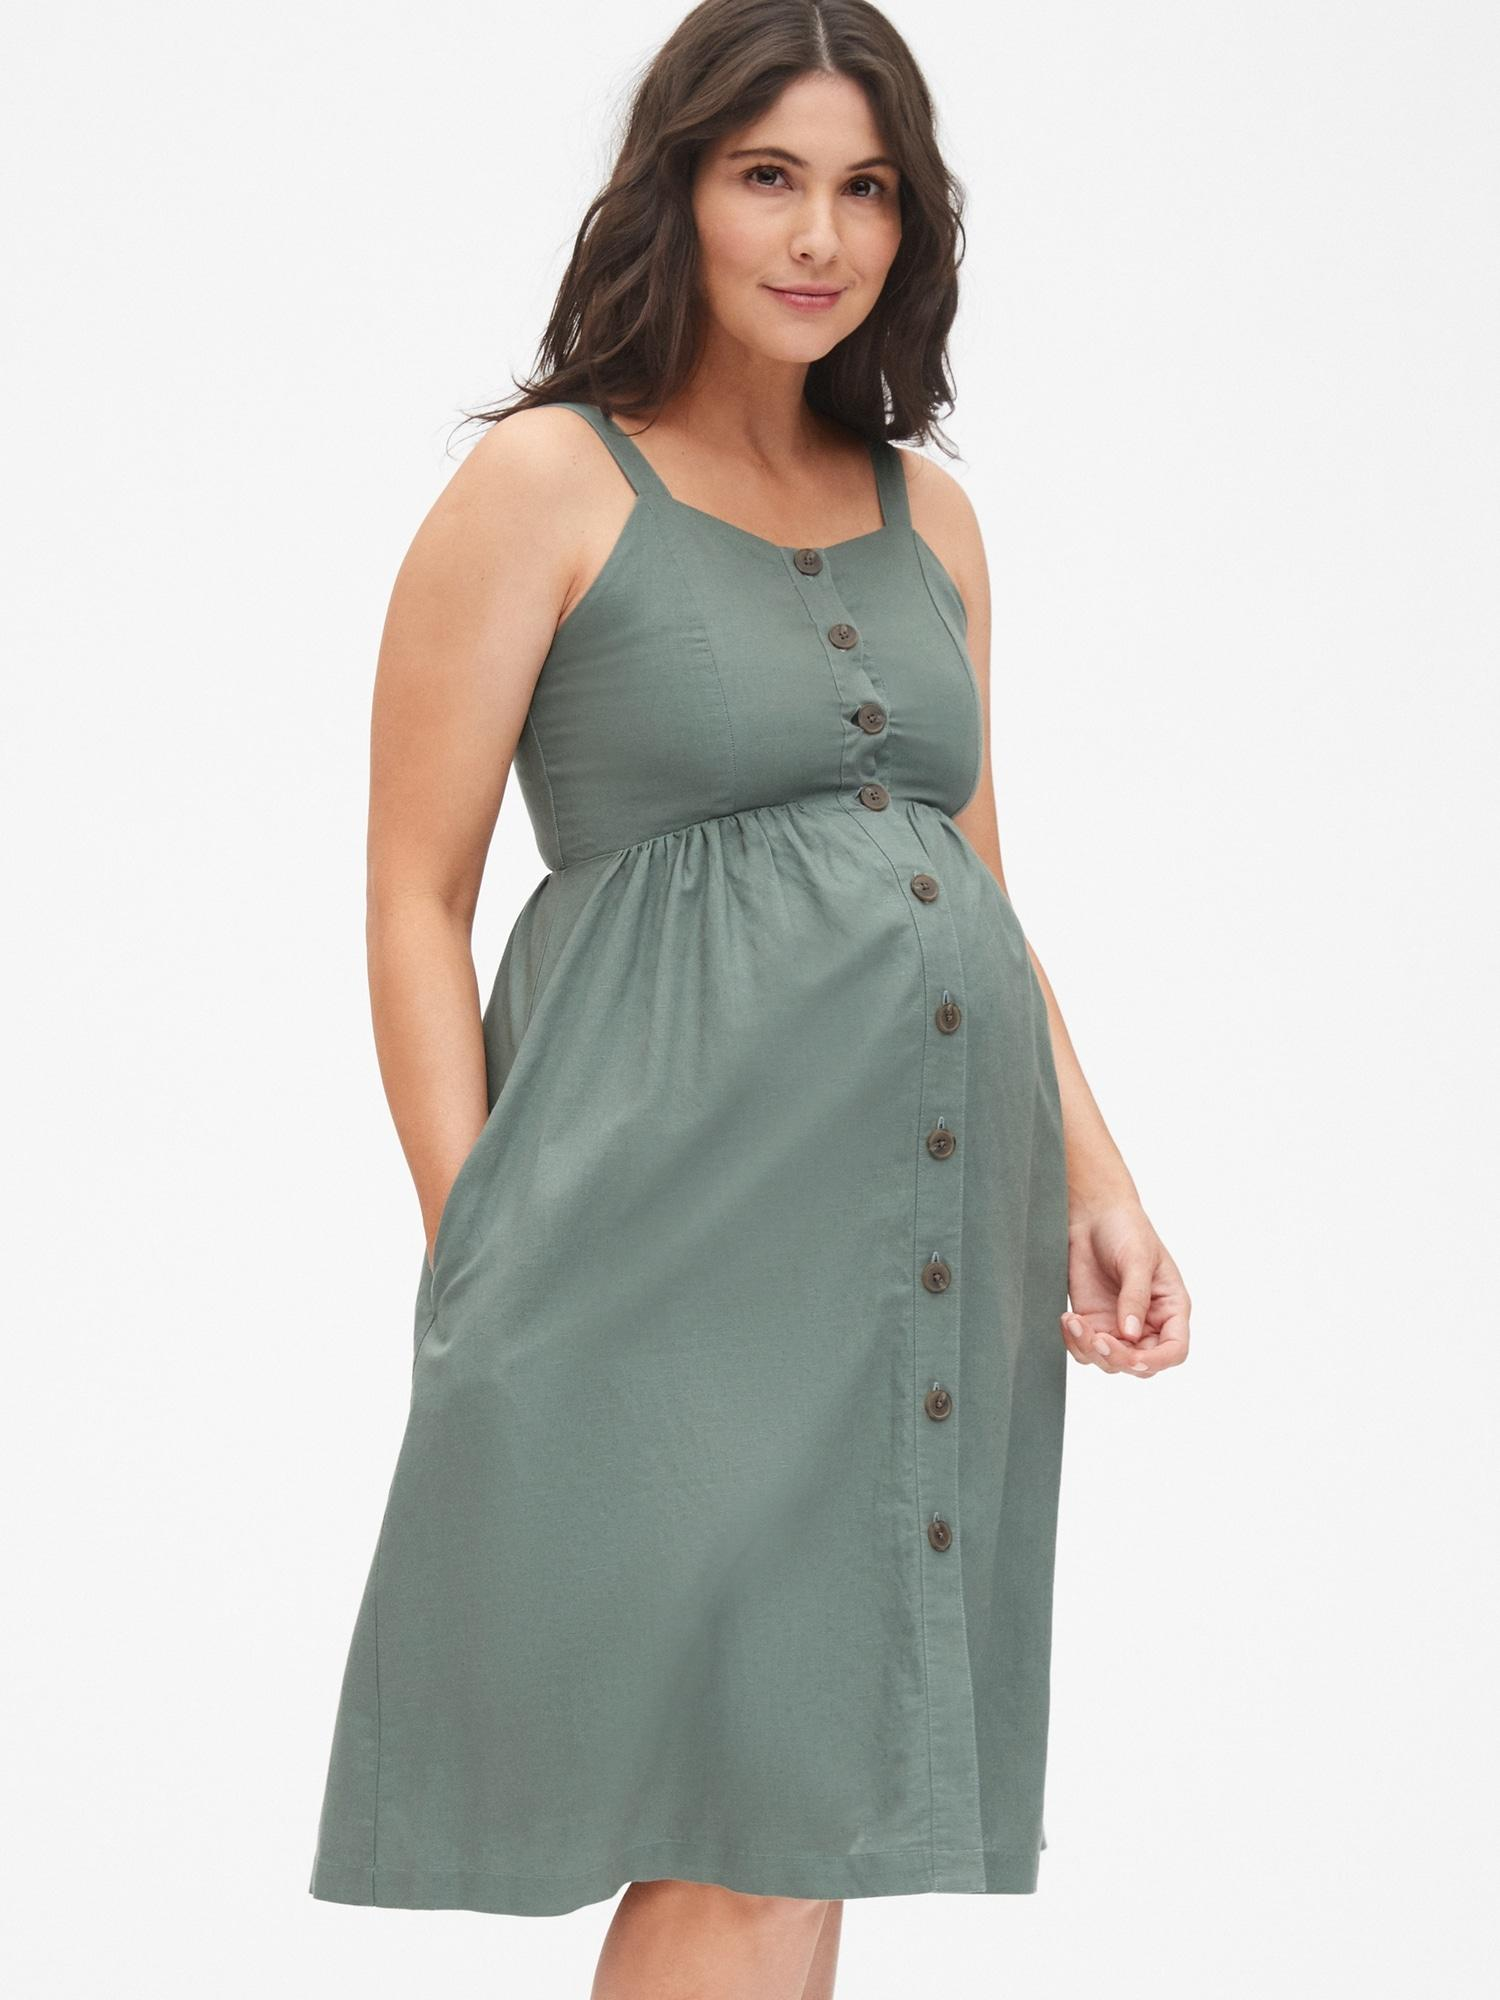 Maternity In Dress Gap Apron Lyst Green WrxdCeEoQB